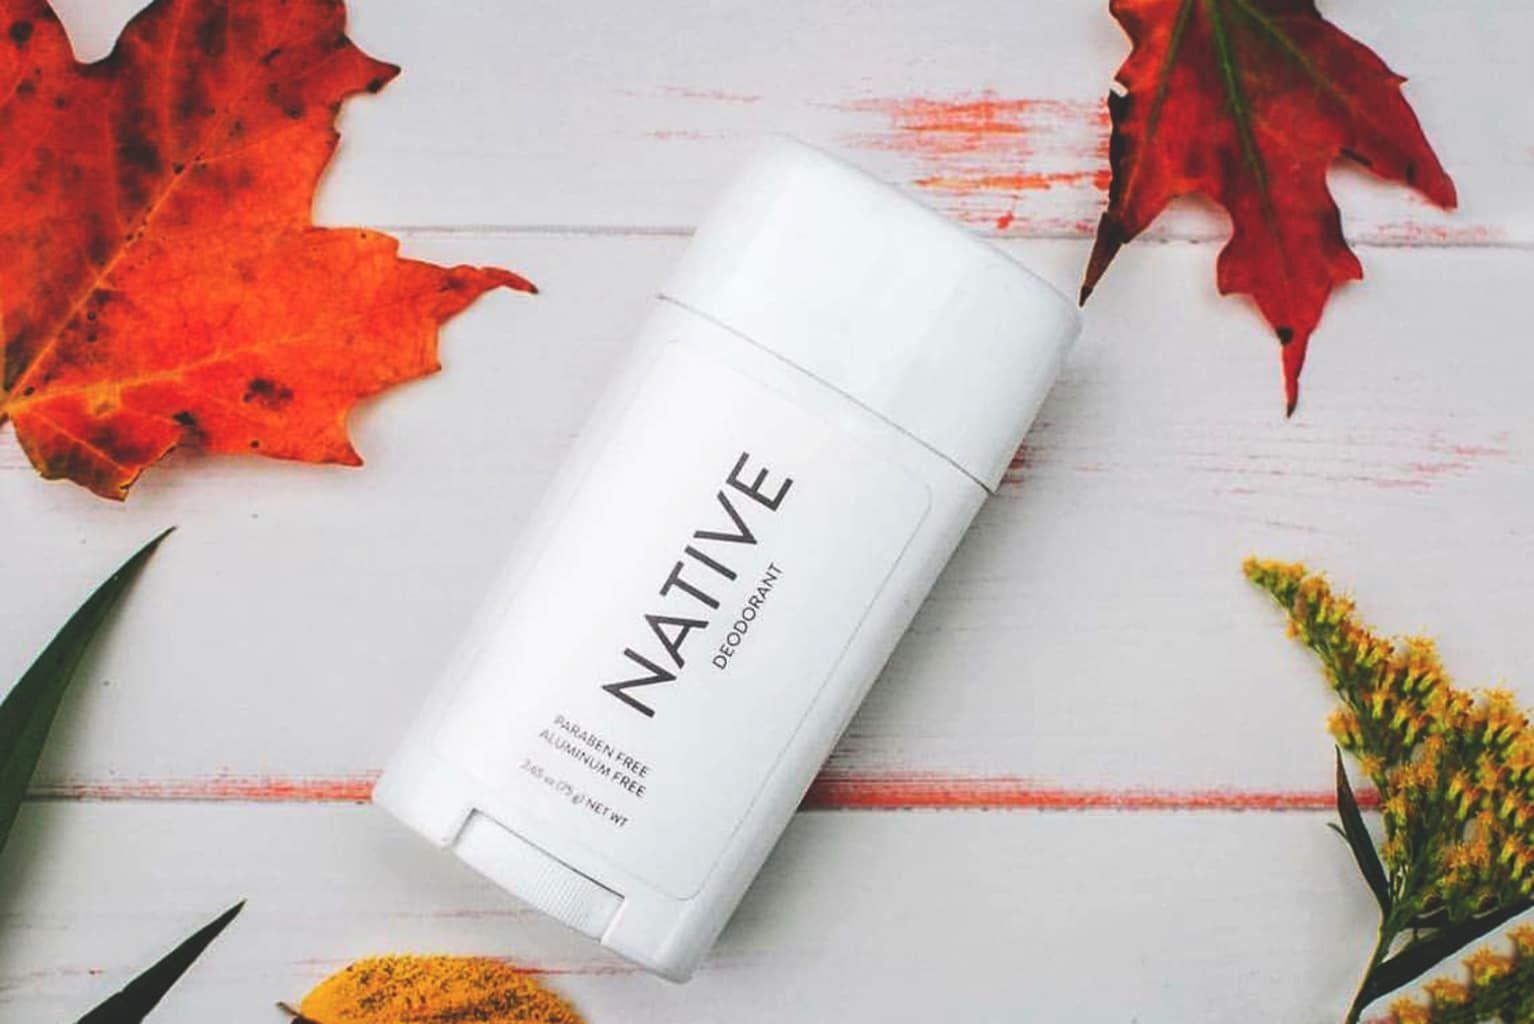 P G Acquired Natural Deodorant Brand Native Mindbodygreen Native Deodorant Natural Deodorant Brands Deodorant